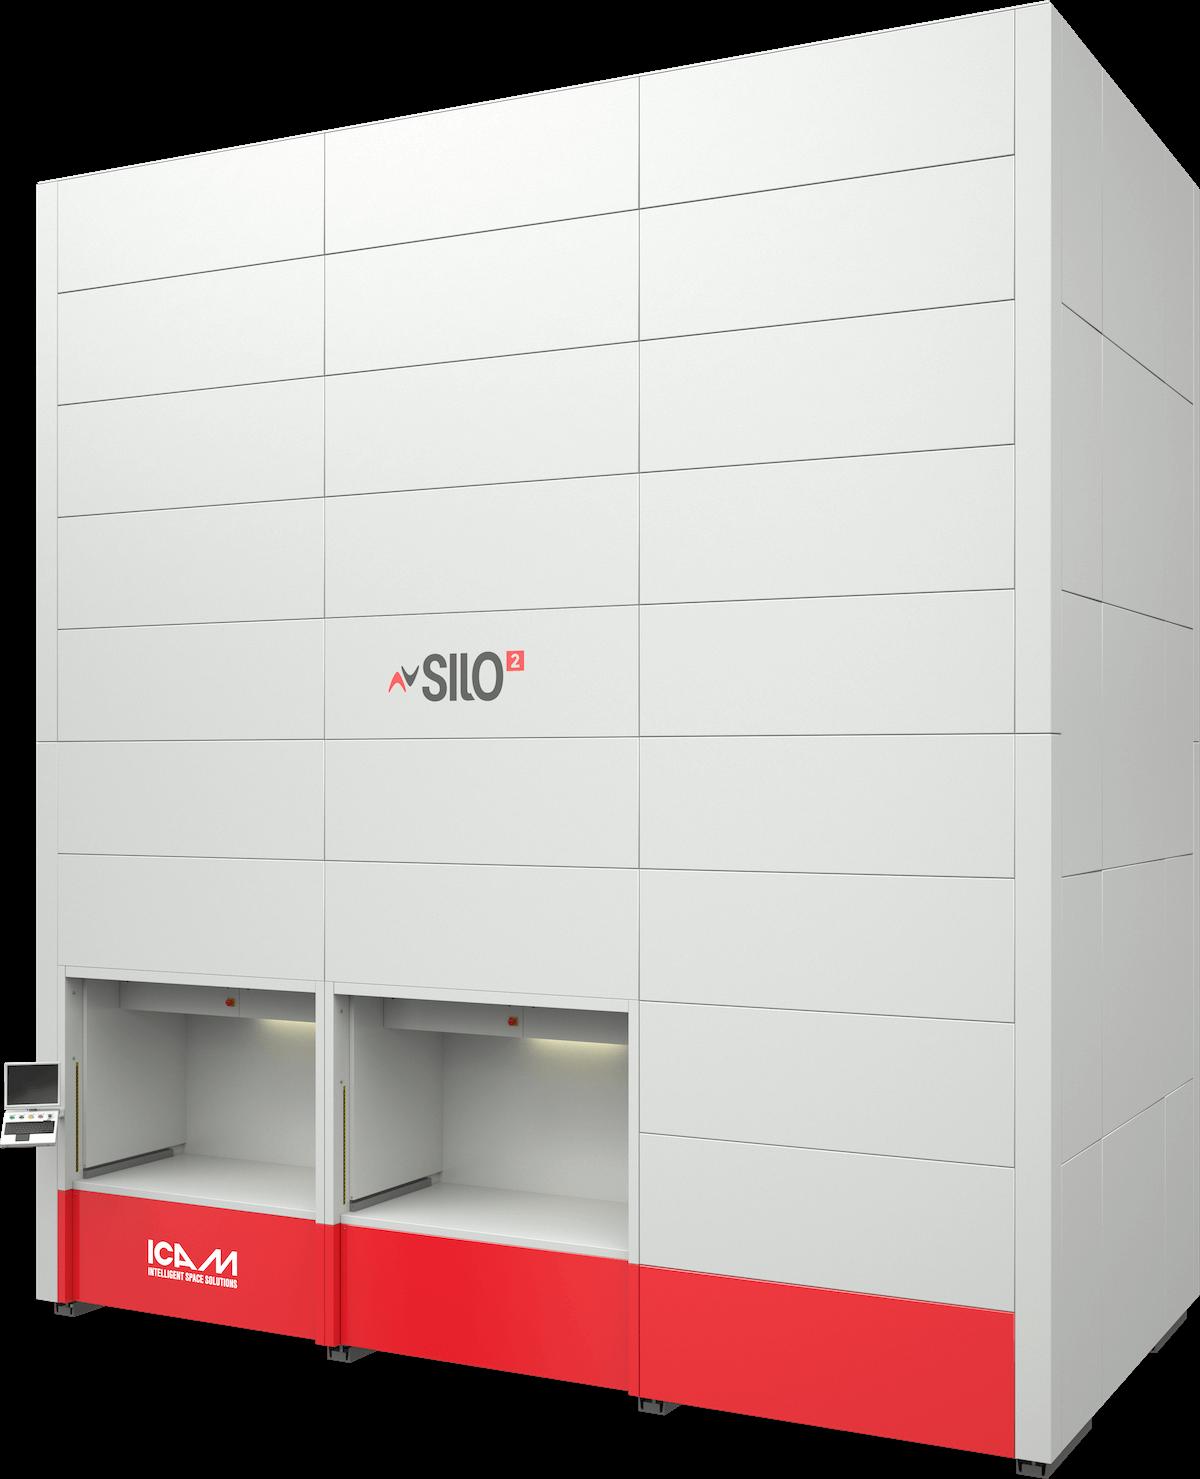 ICAM | Silo² - Industrial